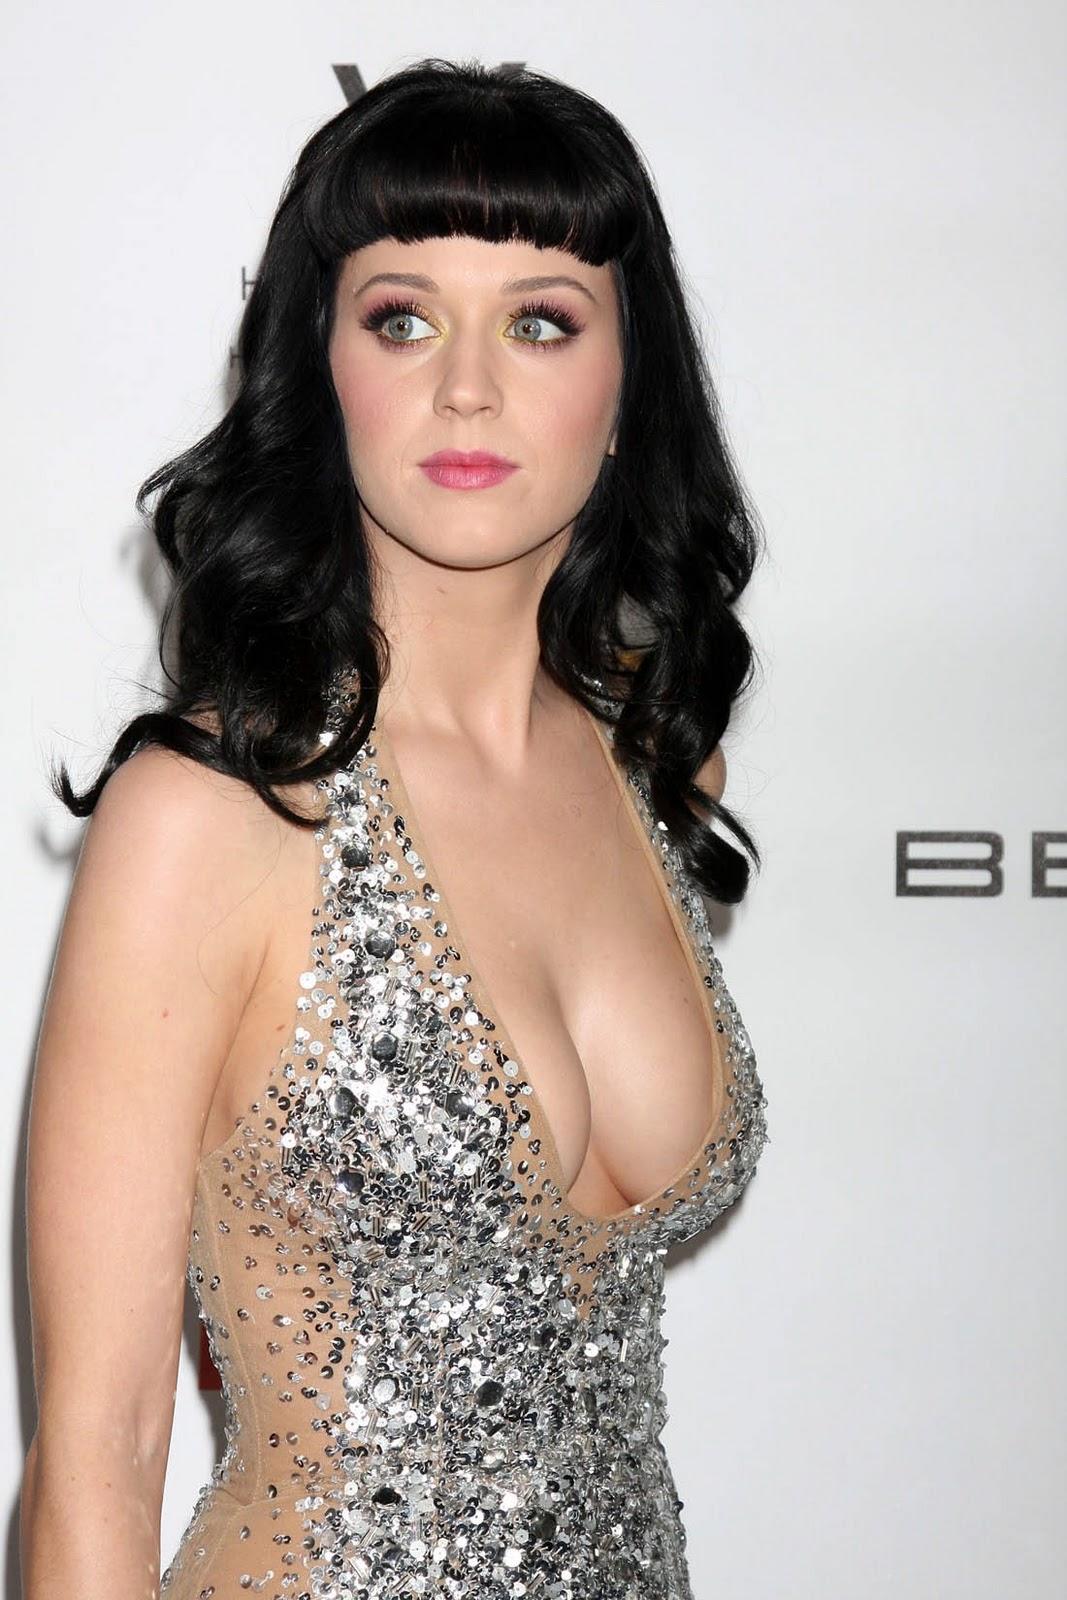 http://2.bp.blogspot.com/-siHD7RdkRIk/TrvrDR_AU2I/AAAAAAAADpA/SzDl6vsx3S8/s1600/katy-perry-cleavage-grammy-02.jpg